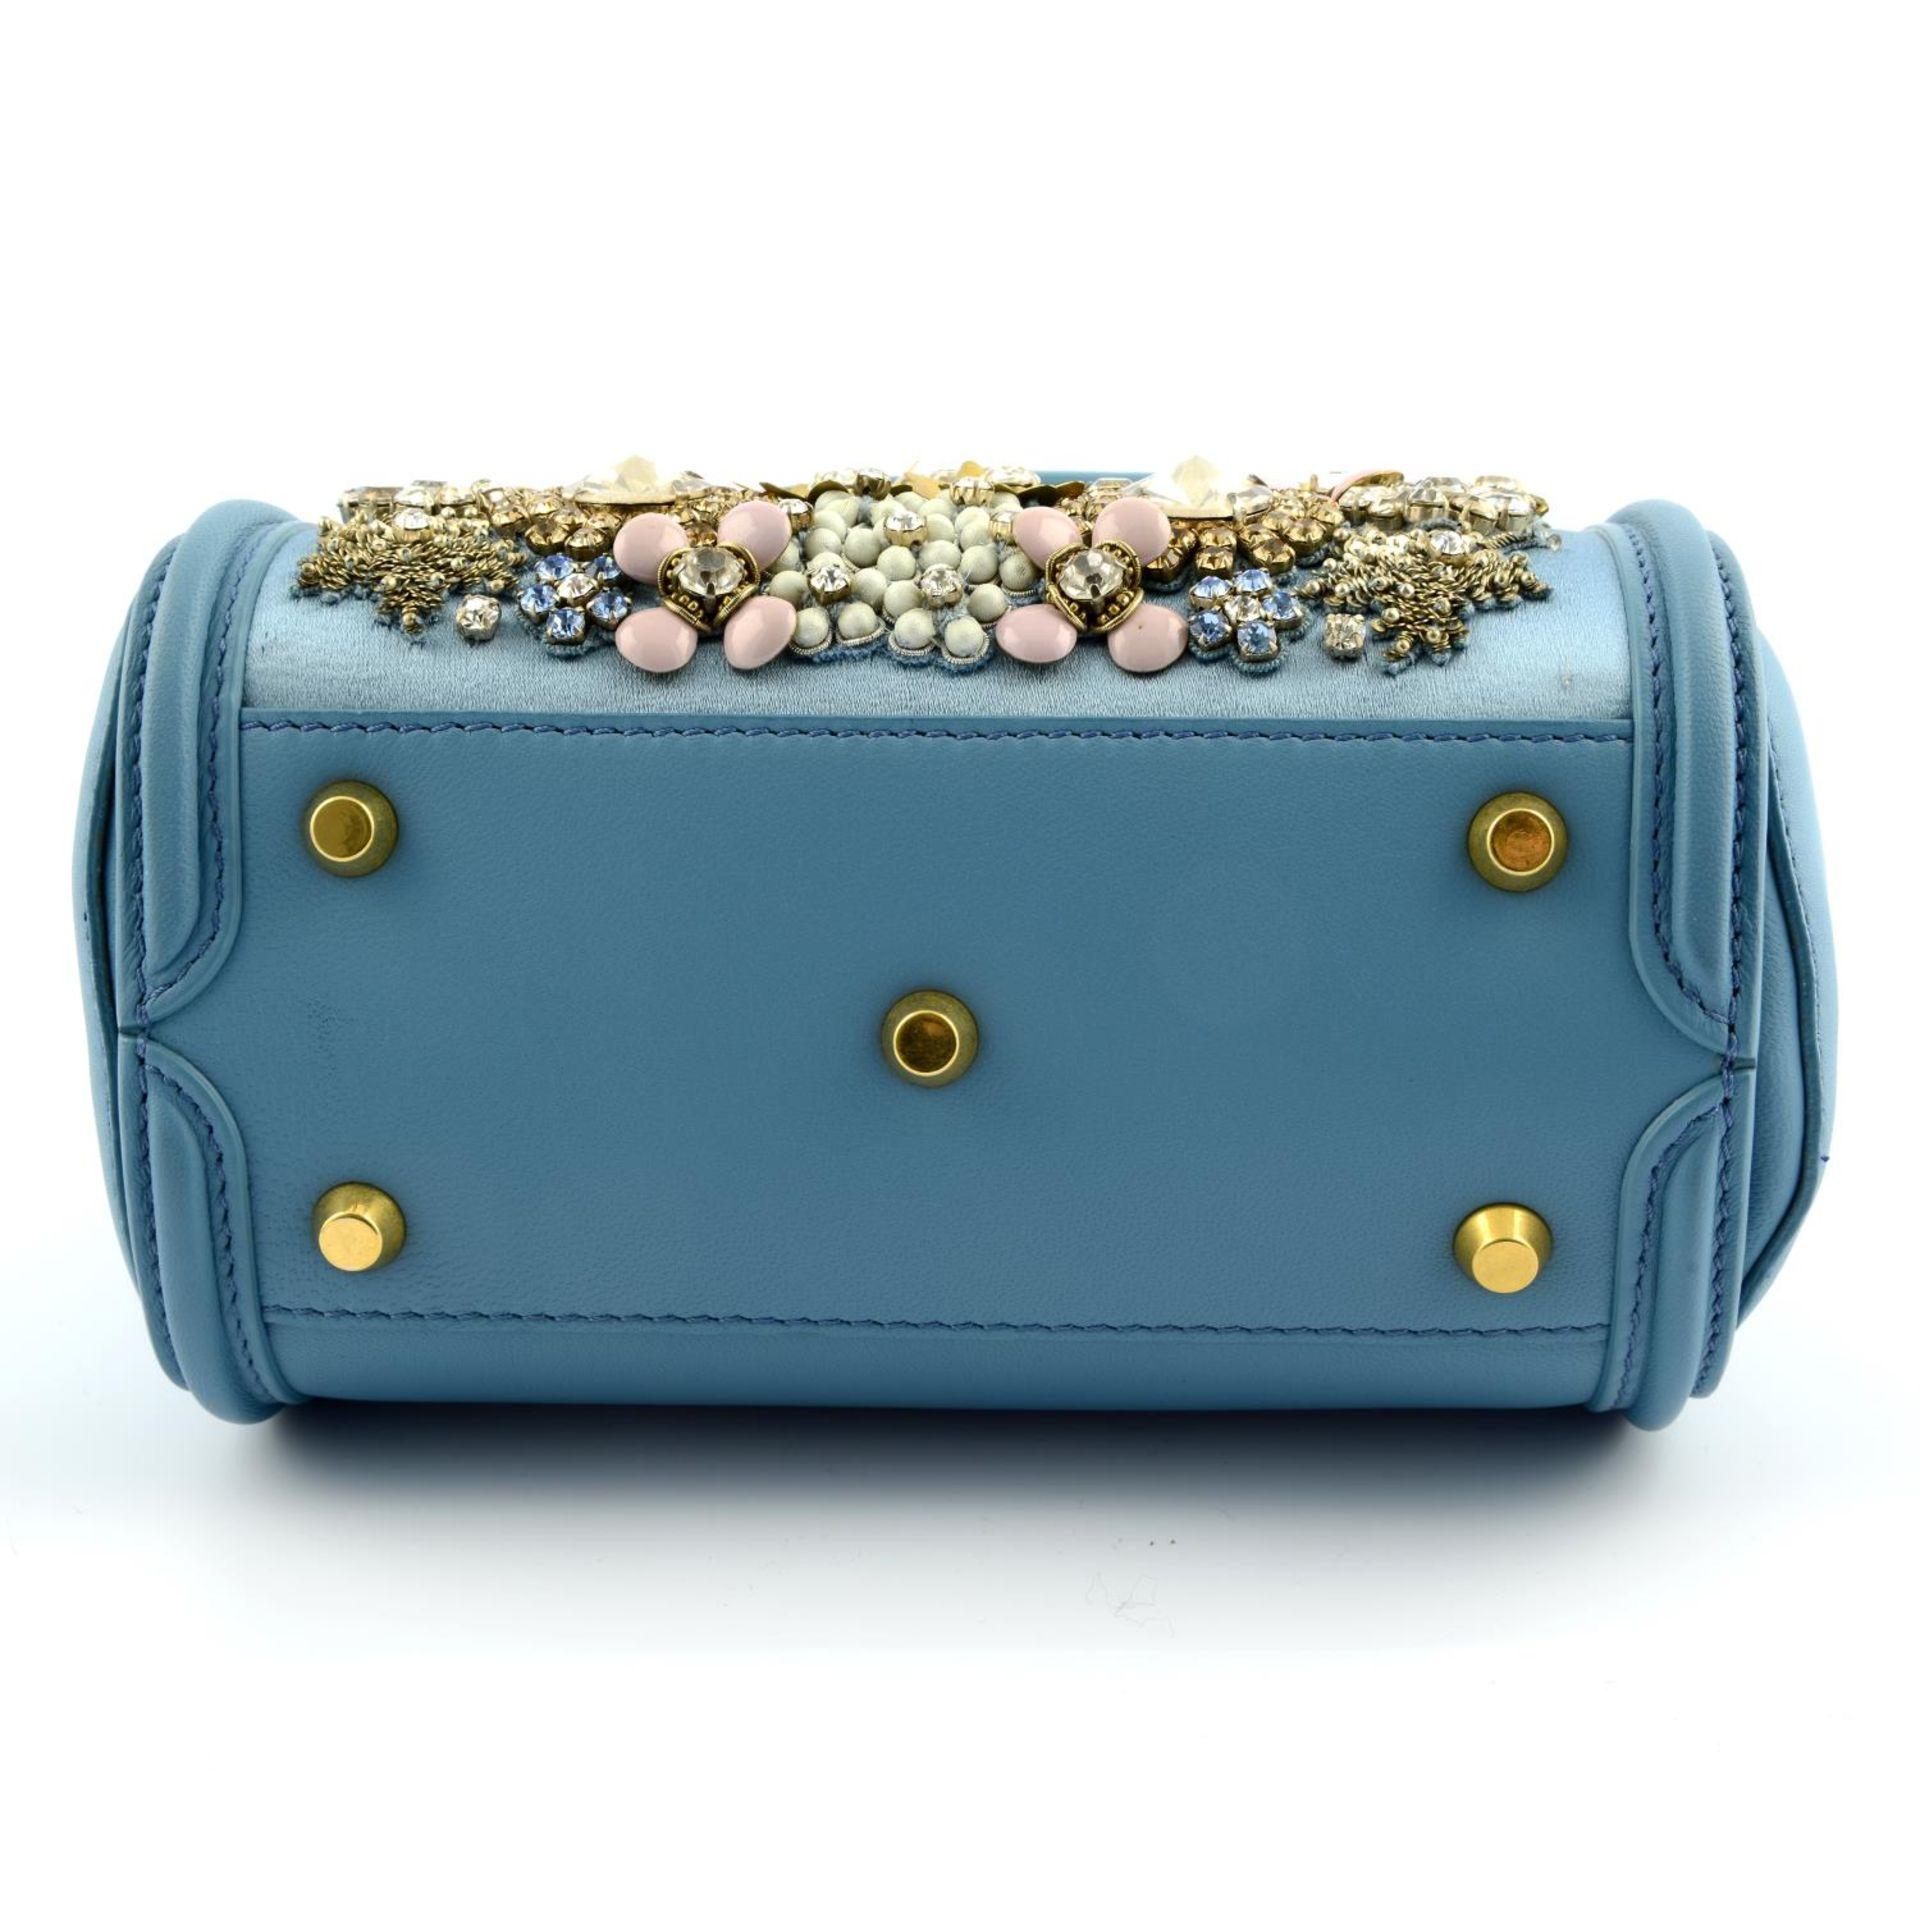 ALEXANDER MCQUEEN - a blue embellished mini Heroine handbag. - Image 5 of 6